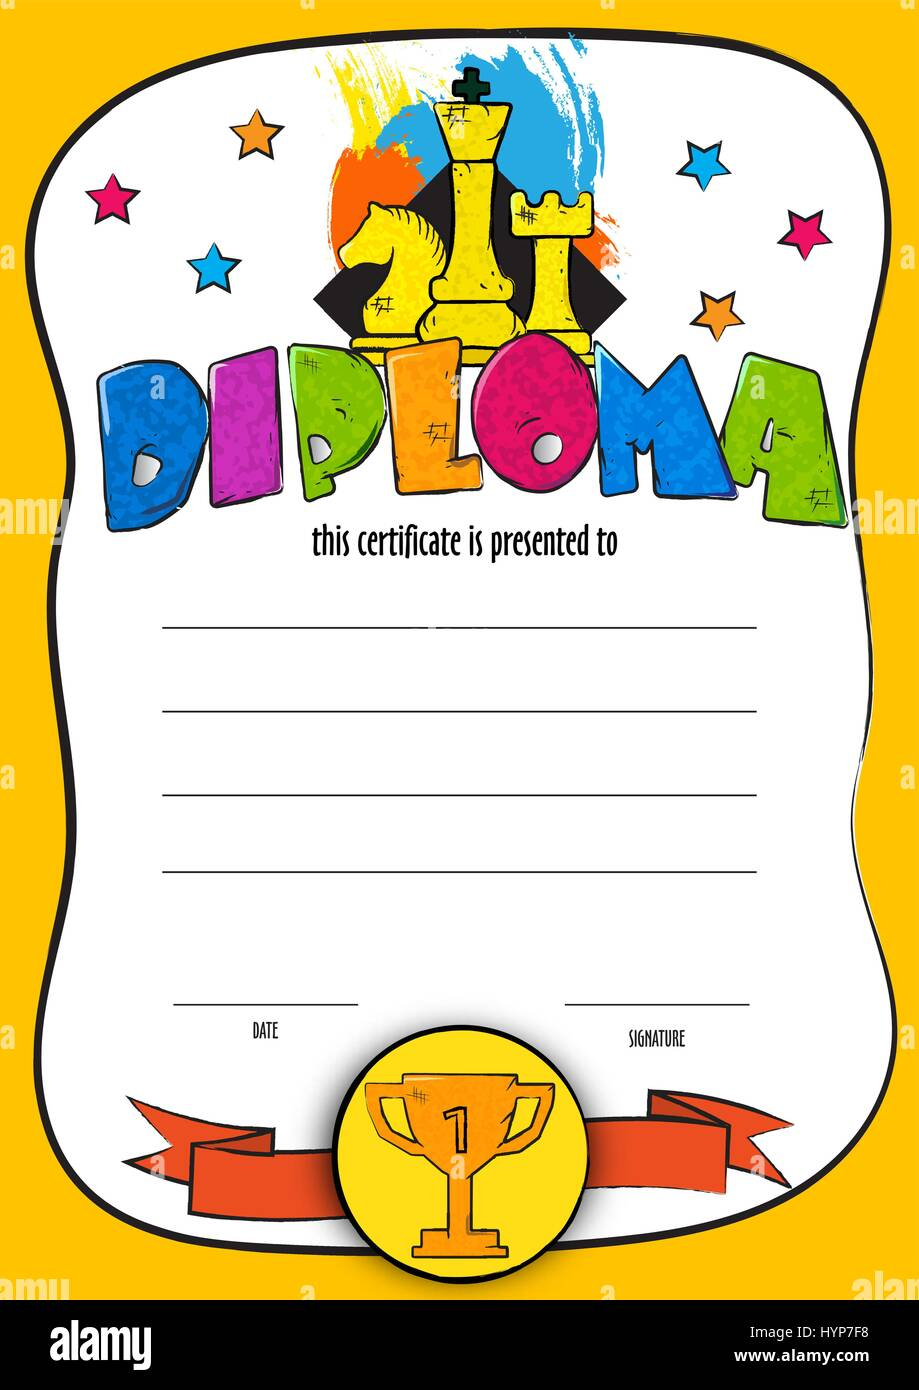 Certificate Diploma Completion Vector Design Stockfotos ...